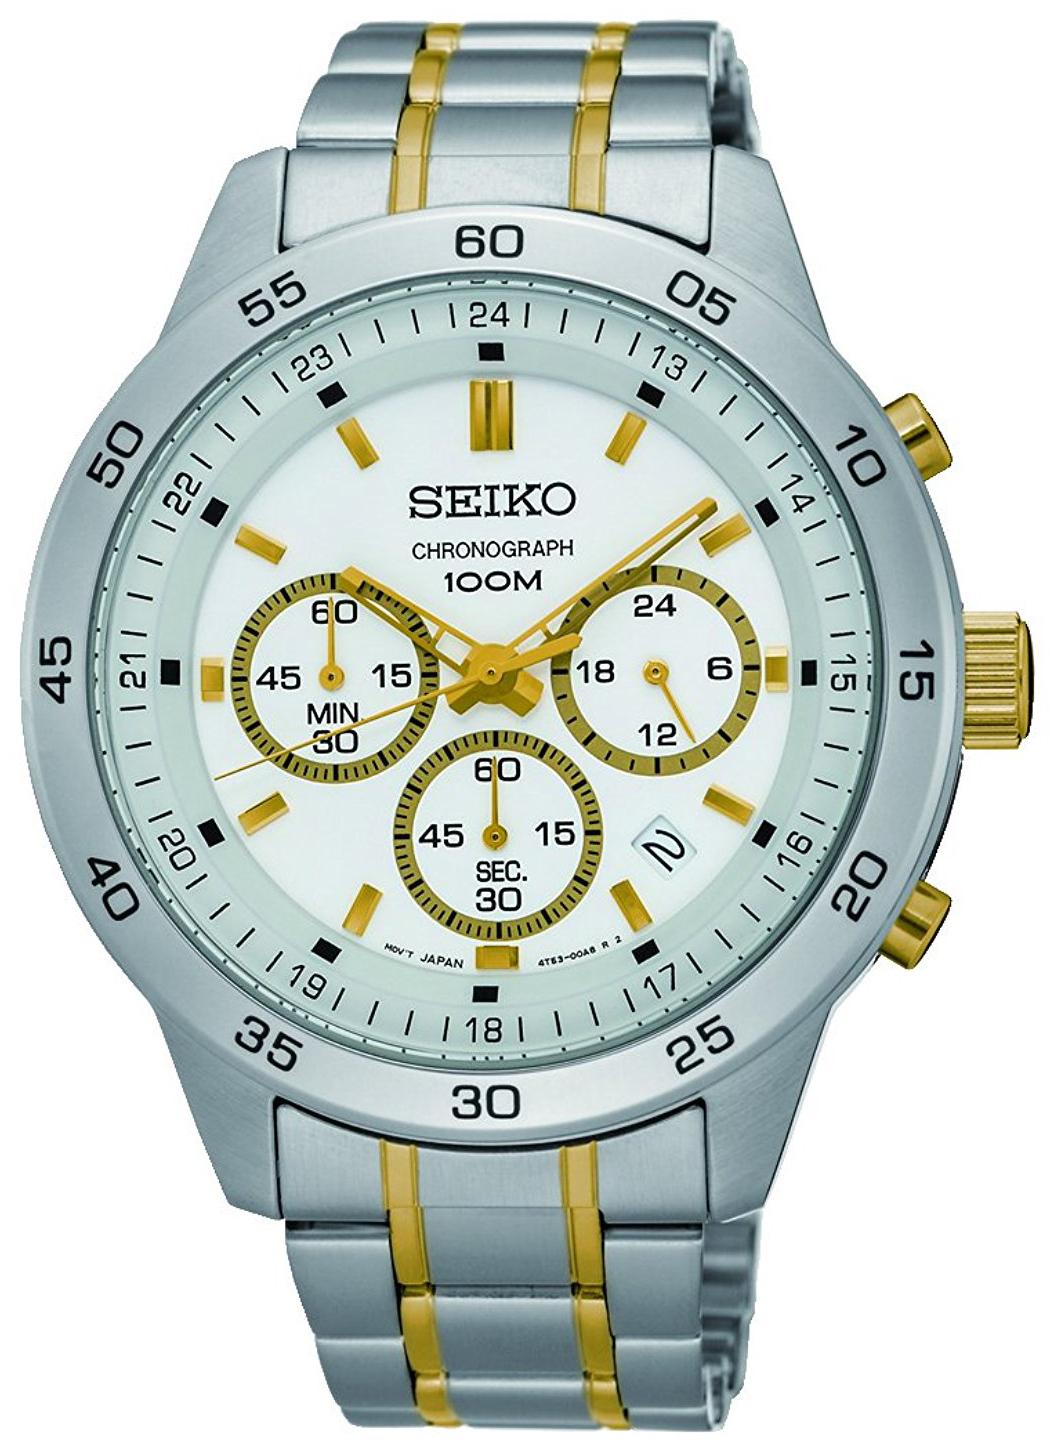 Seiko Chronograph Herrklocka SKS523P1 Vit/Gulguldtonat stål Ø44 mm - Seiko